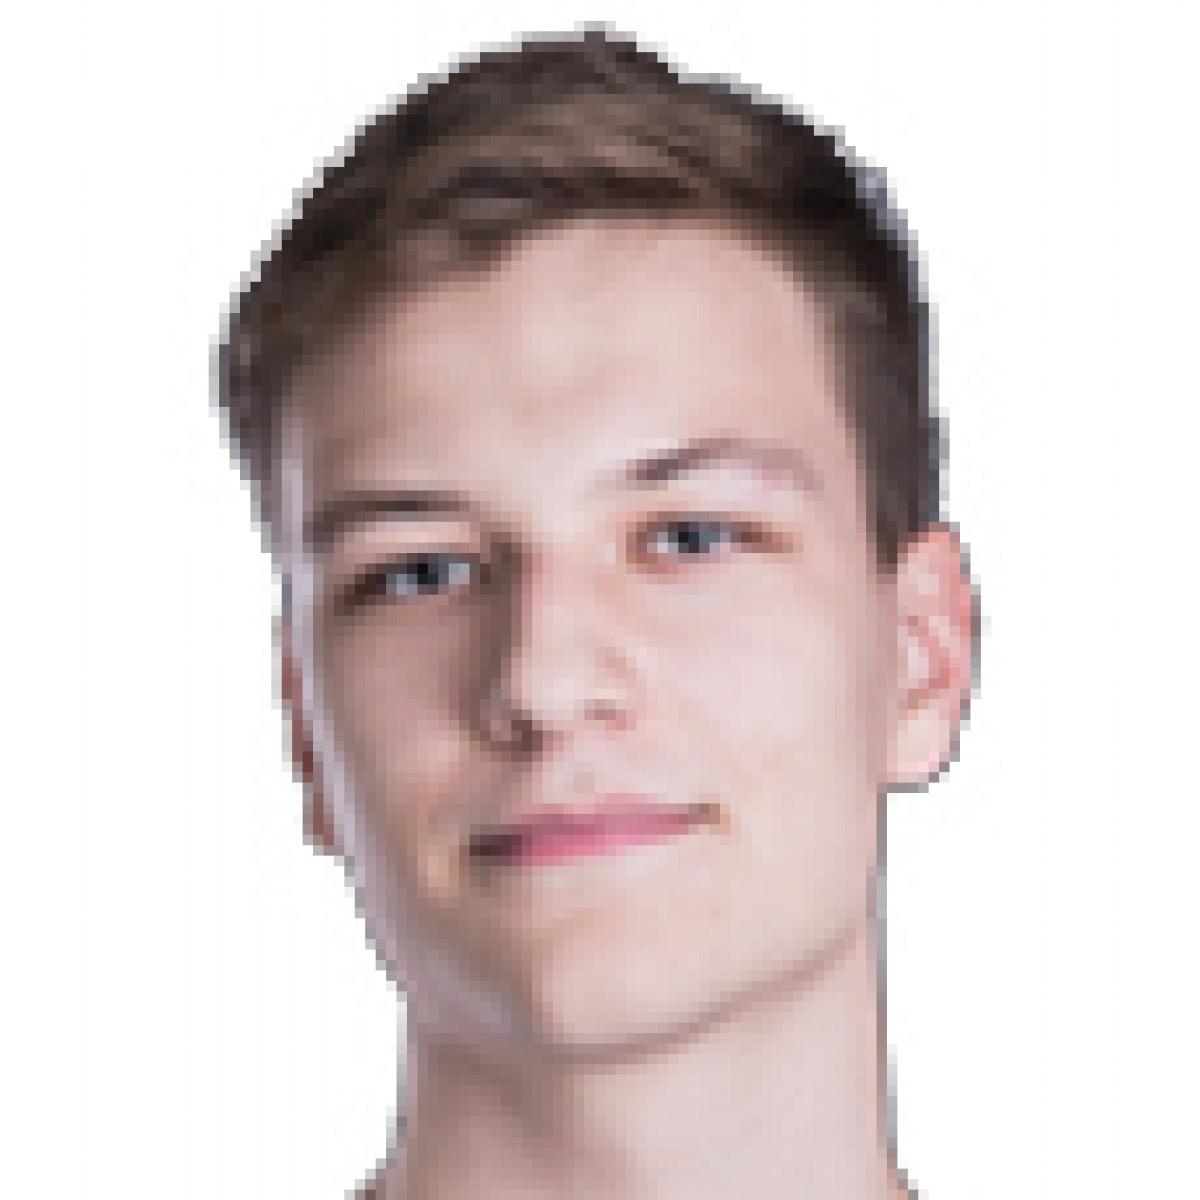 Mateusz Cwirko-Godycki